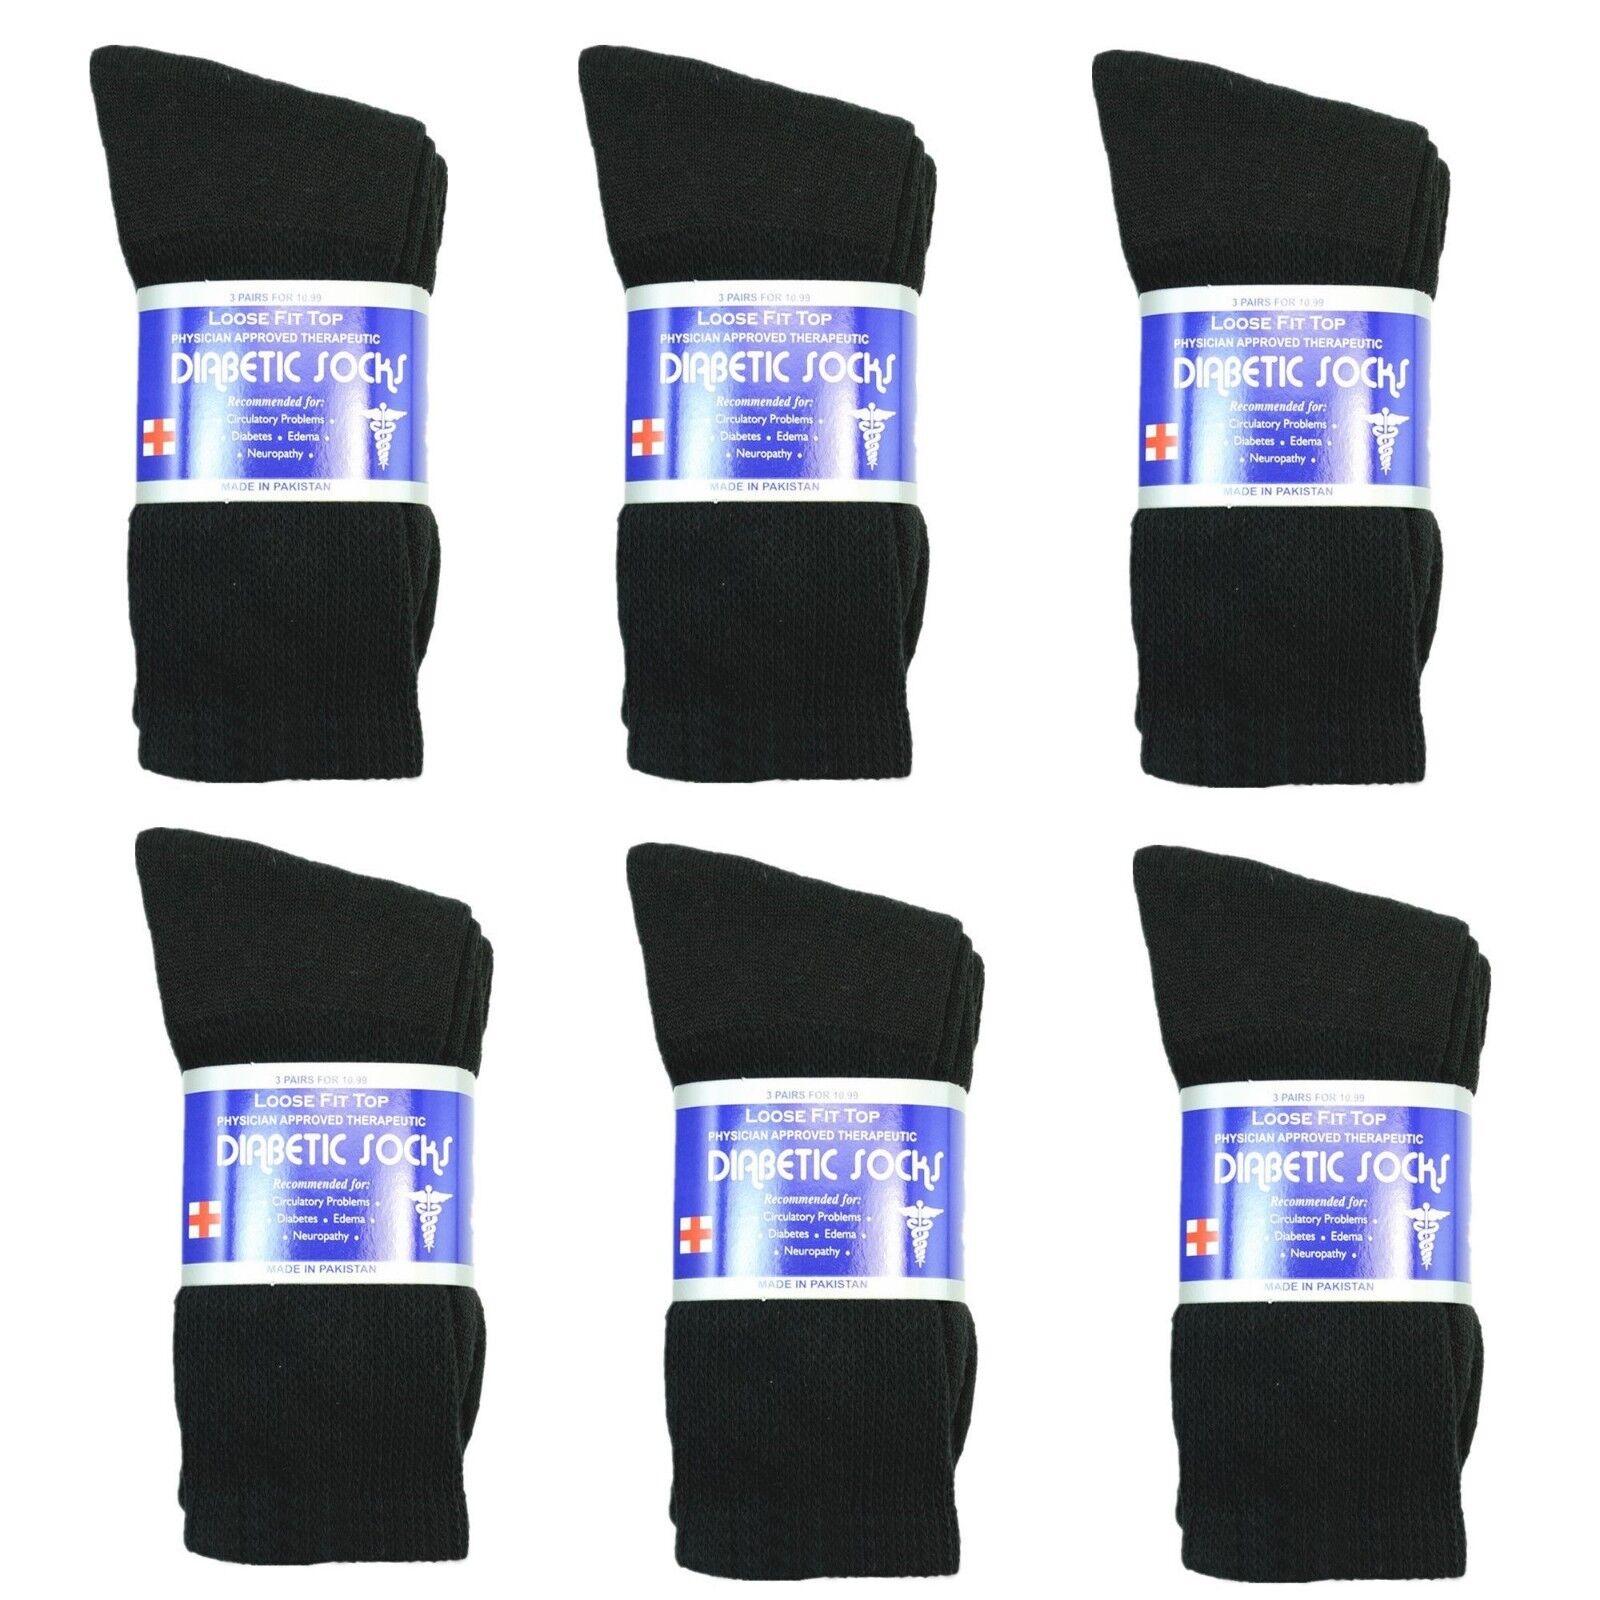 new diabetic crew socks circulatory health cotton